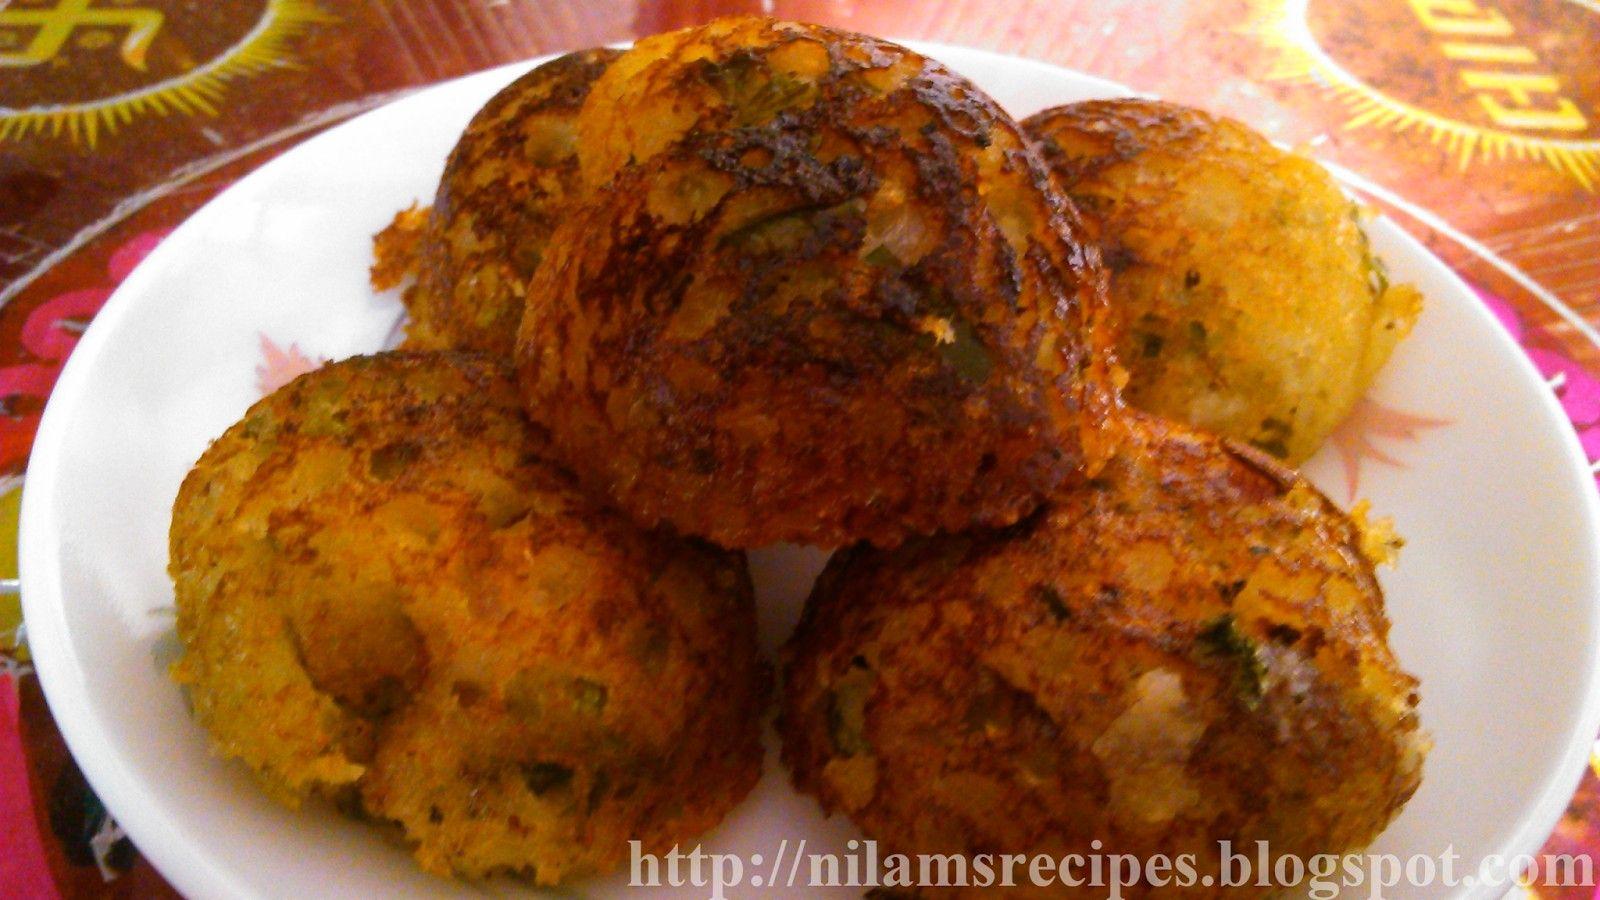 Instant appe maharashtrian recipes recipes instant appe maharashtrian recipes forumfinder Image collections